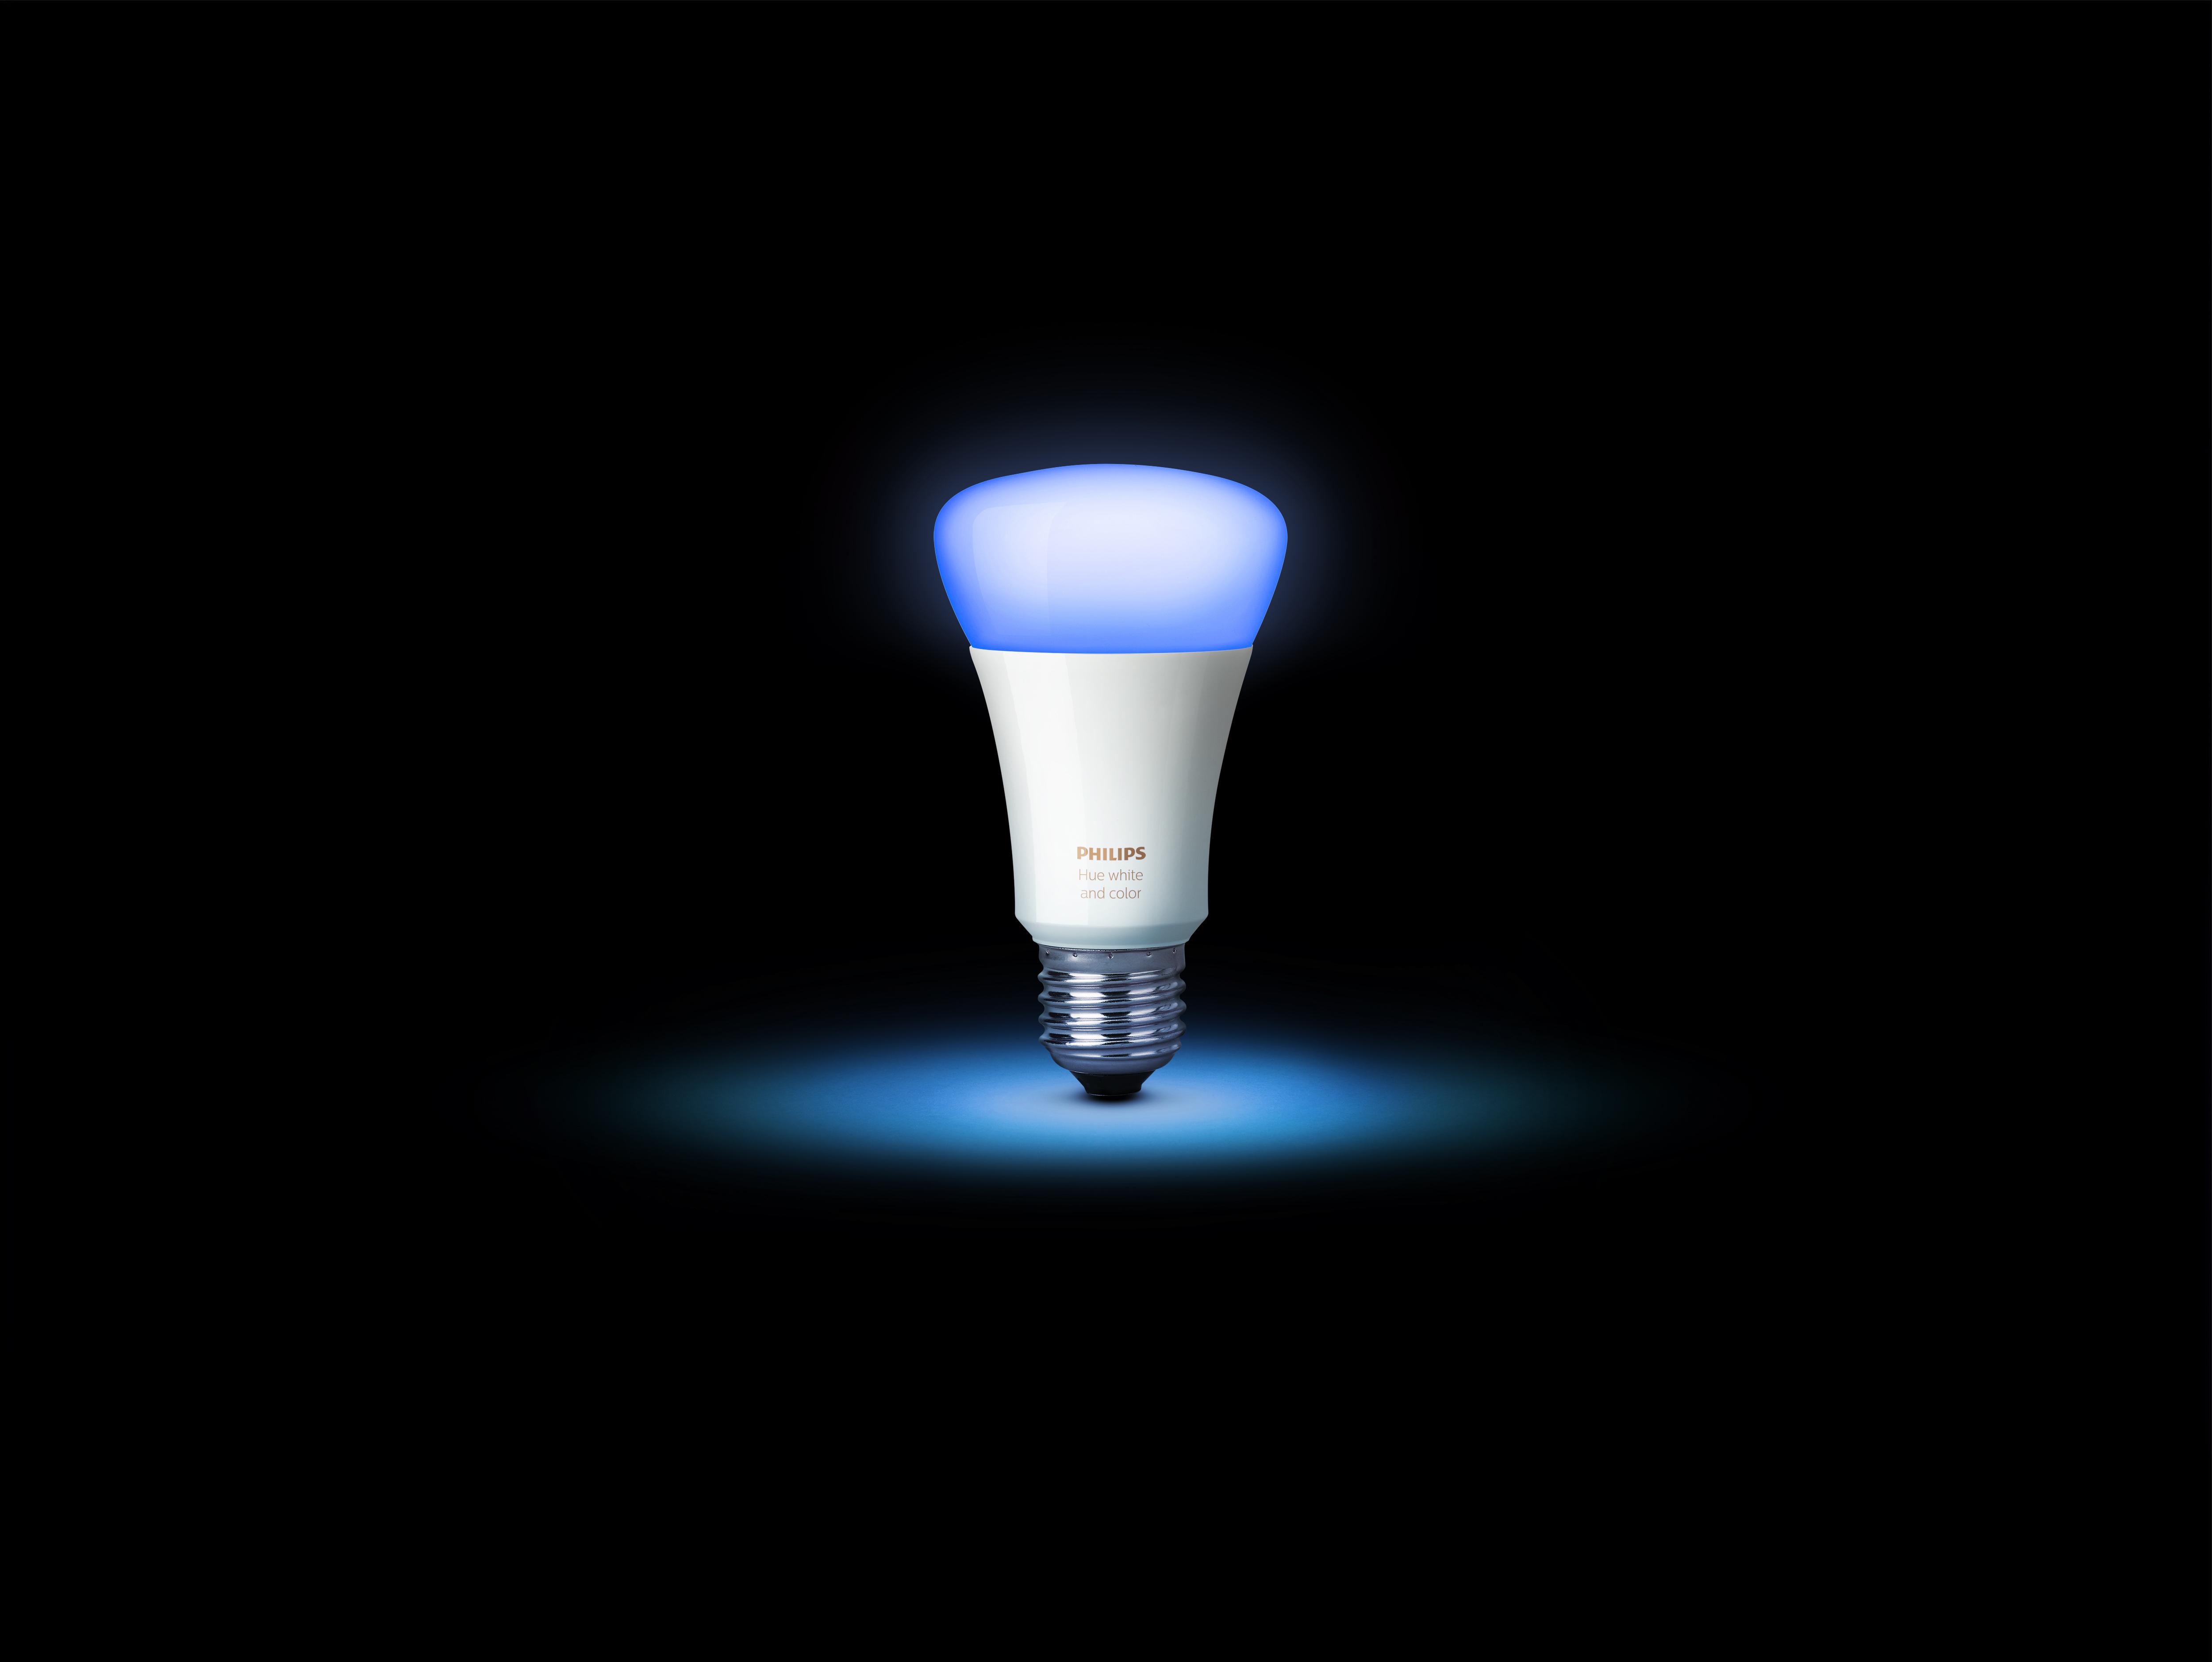 philips hue new a19 bulb cyan - Philips Hue Color